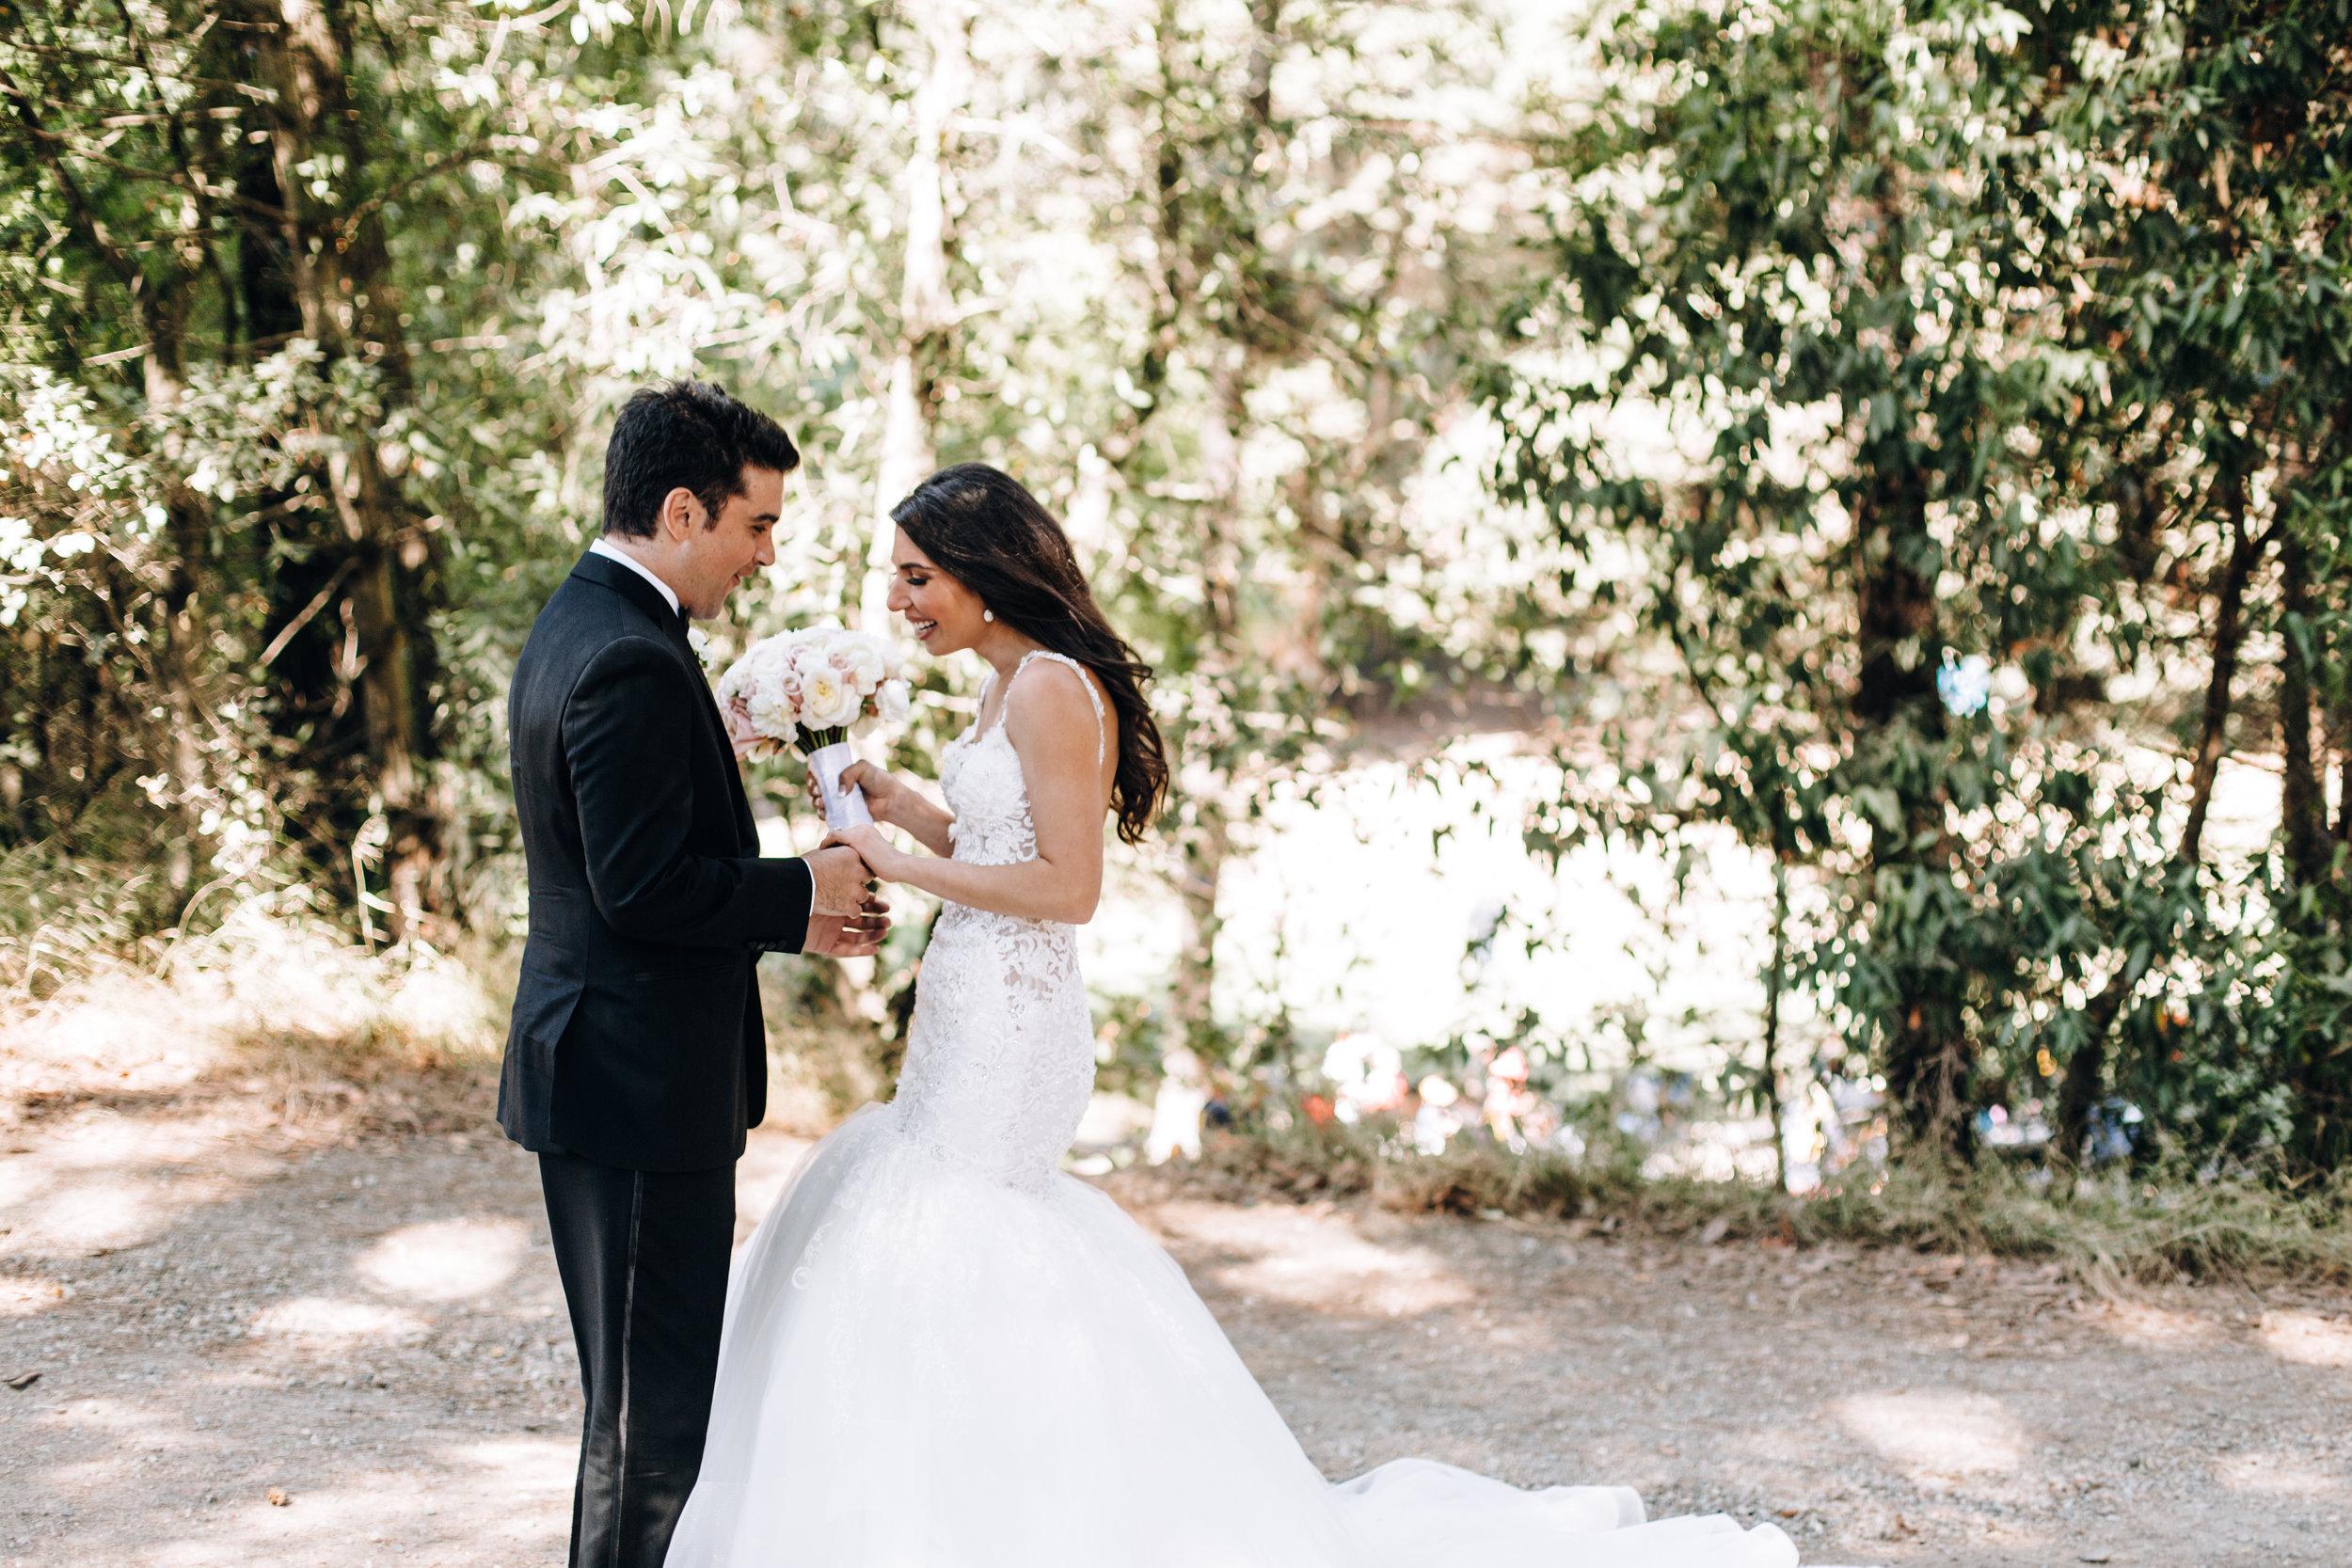 KaraNixonWeddings-GreekOrthodox-Oakland-Wedding-16.jpg